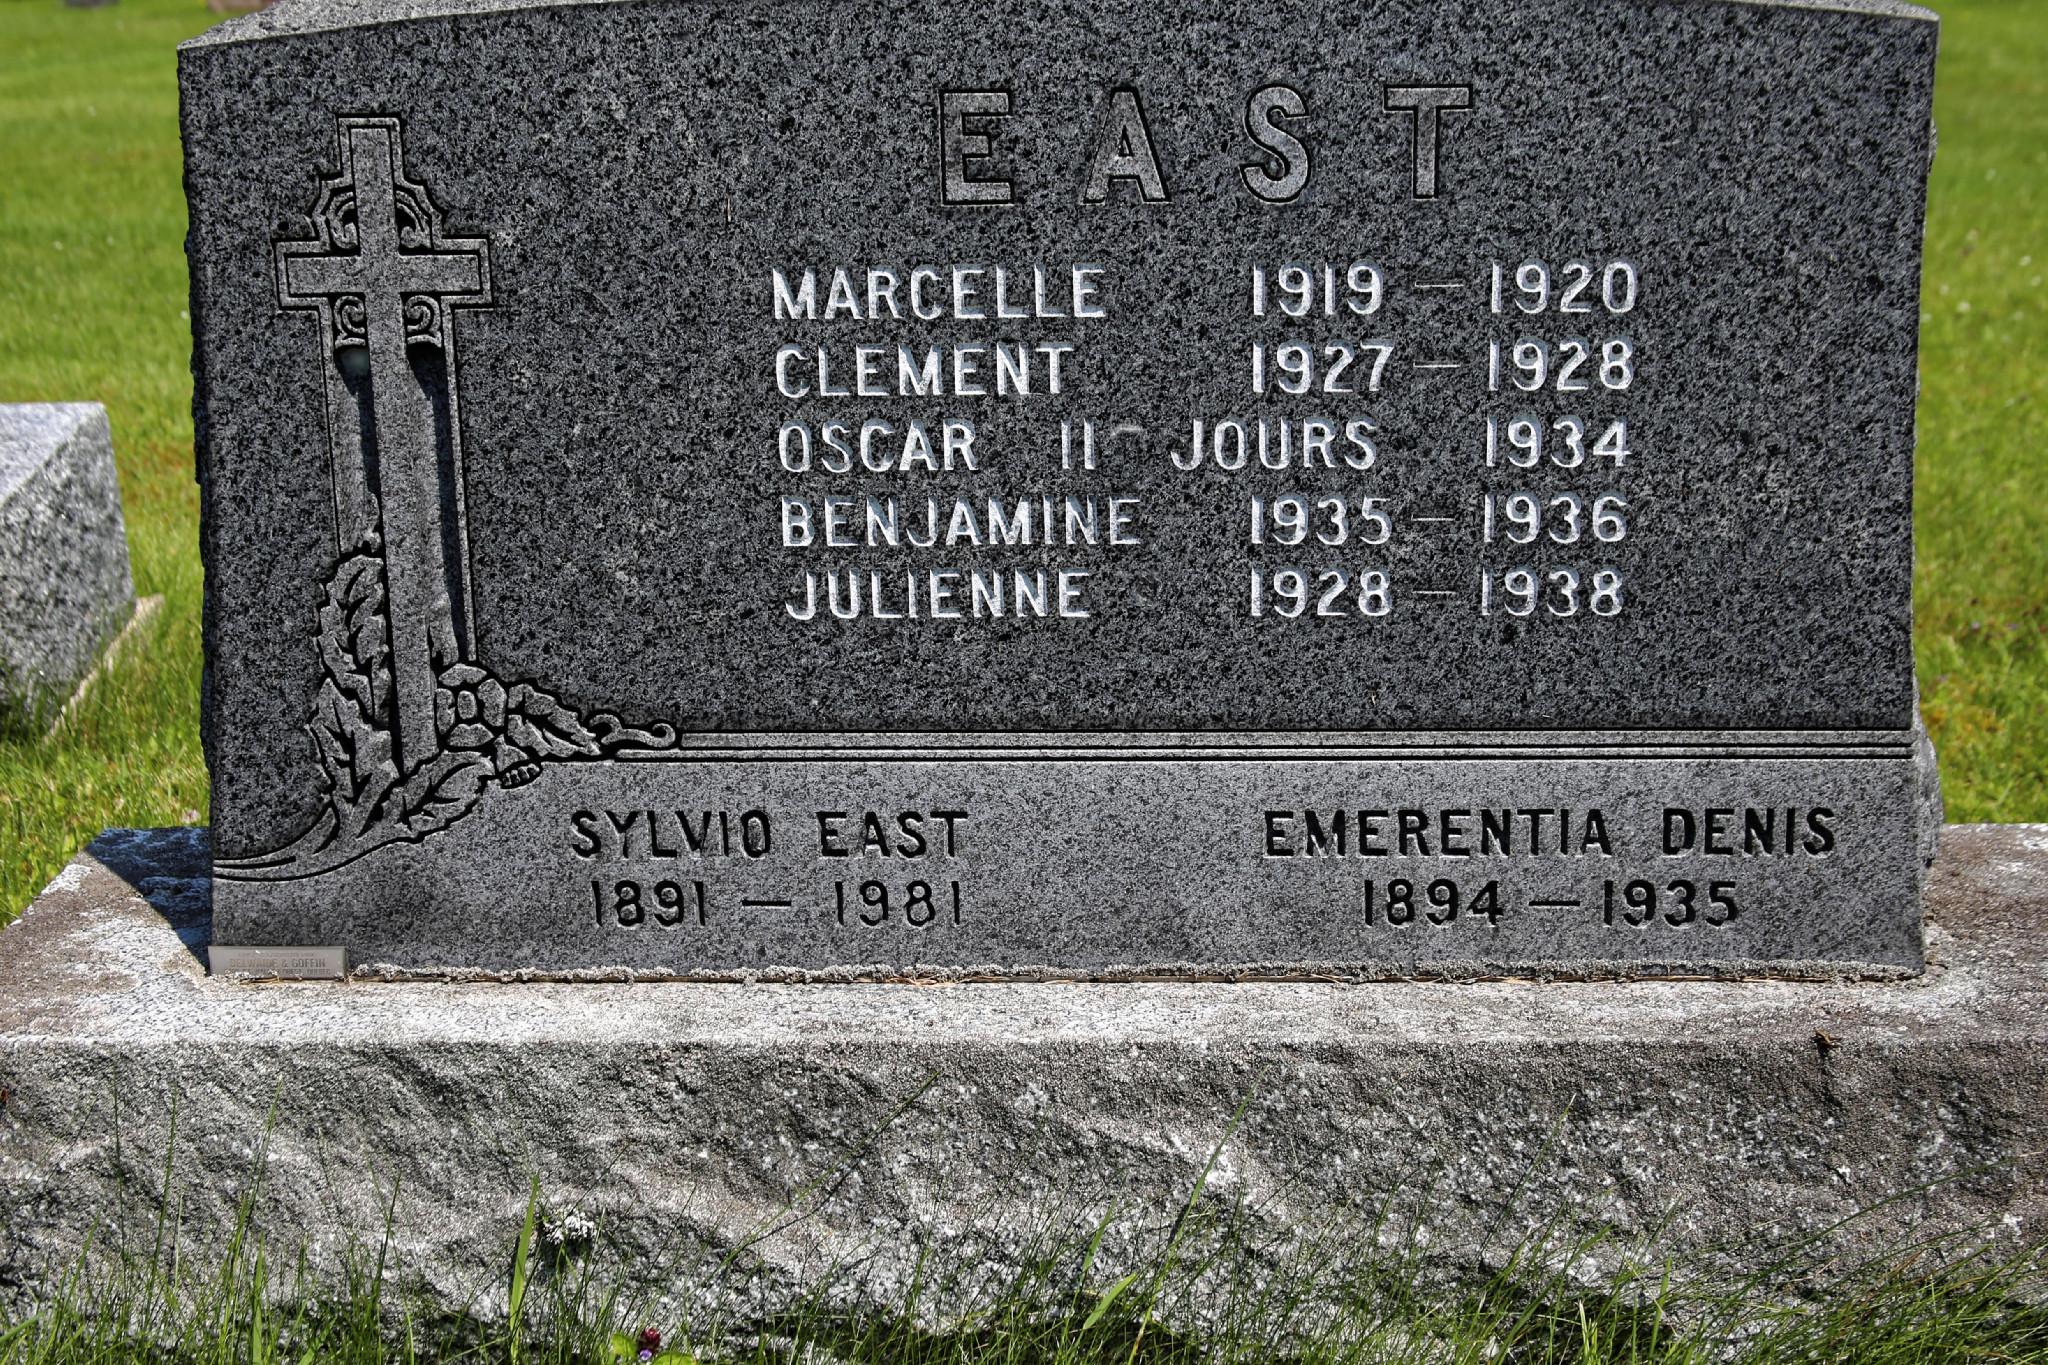 Sylvio East